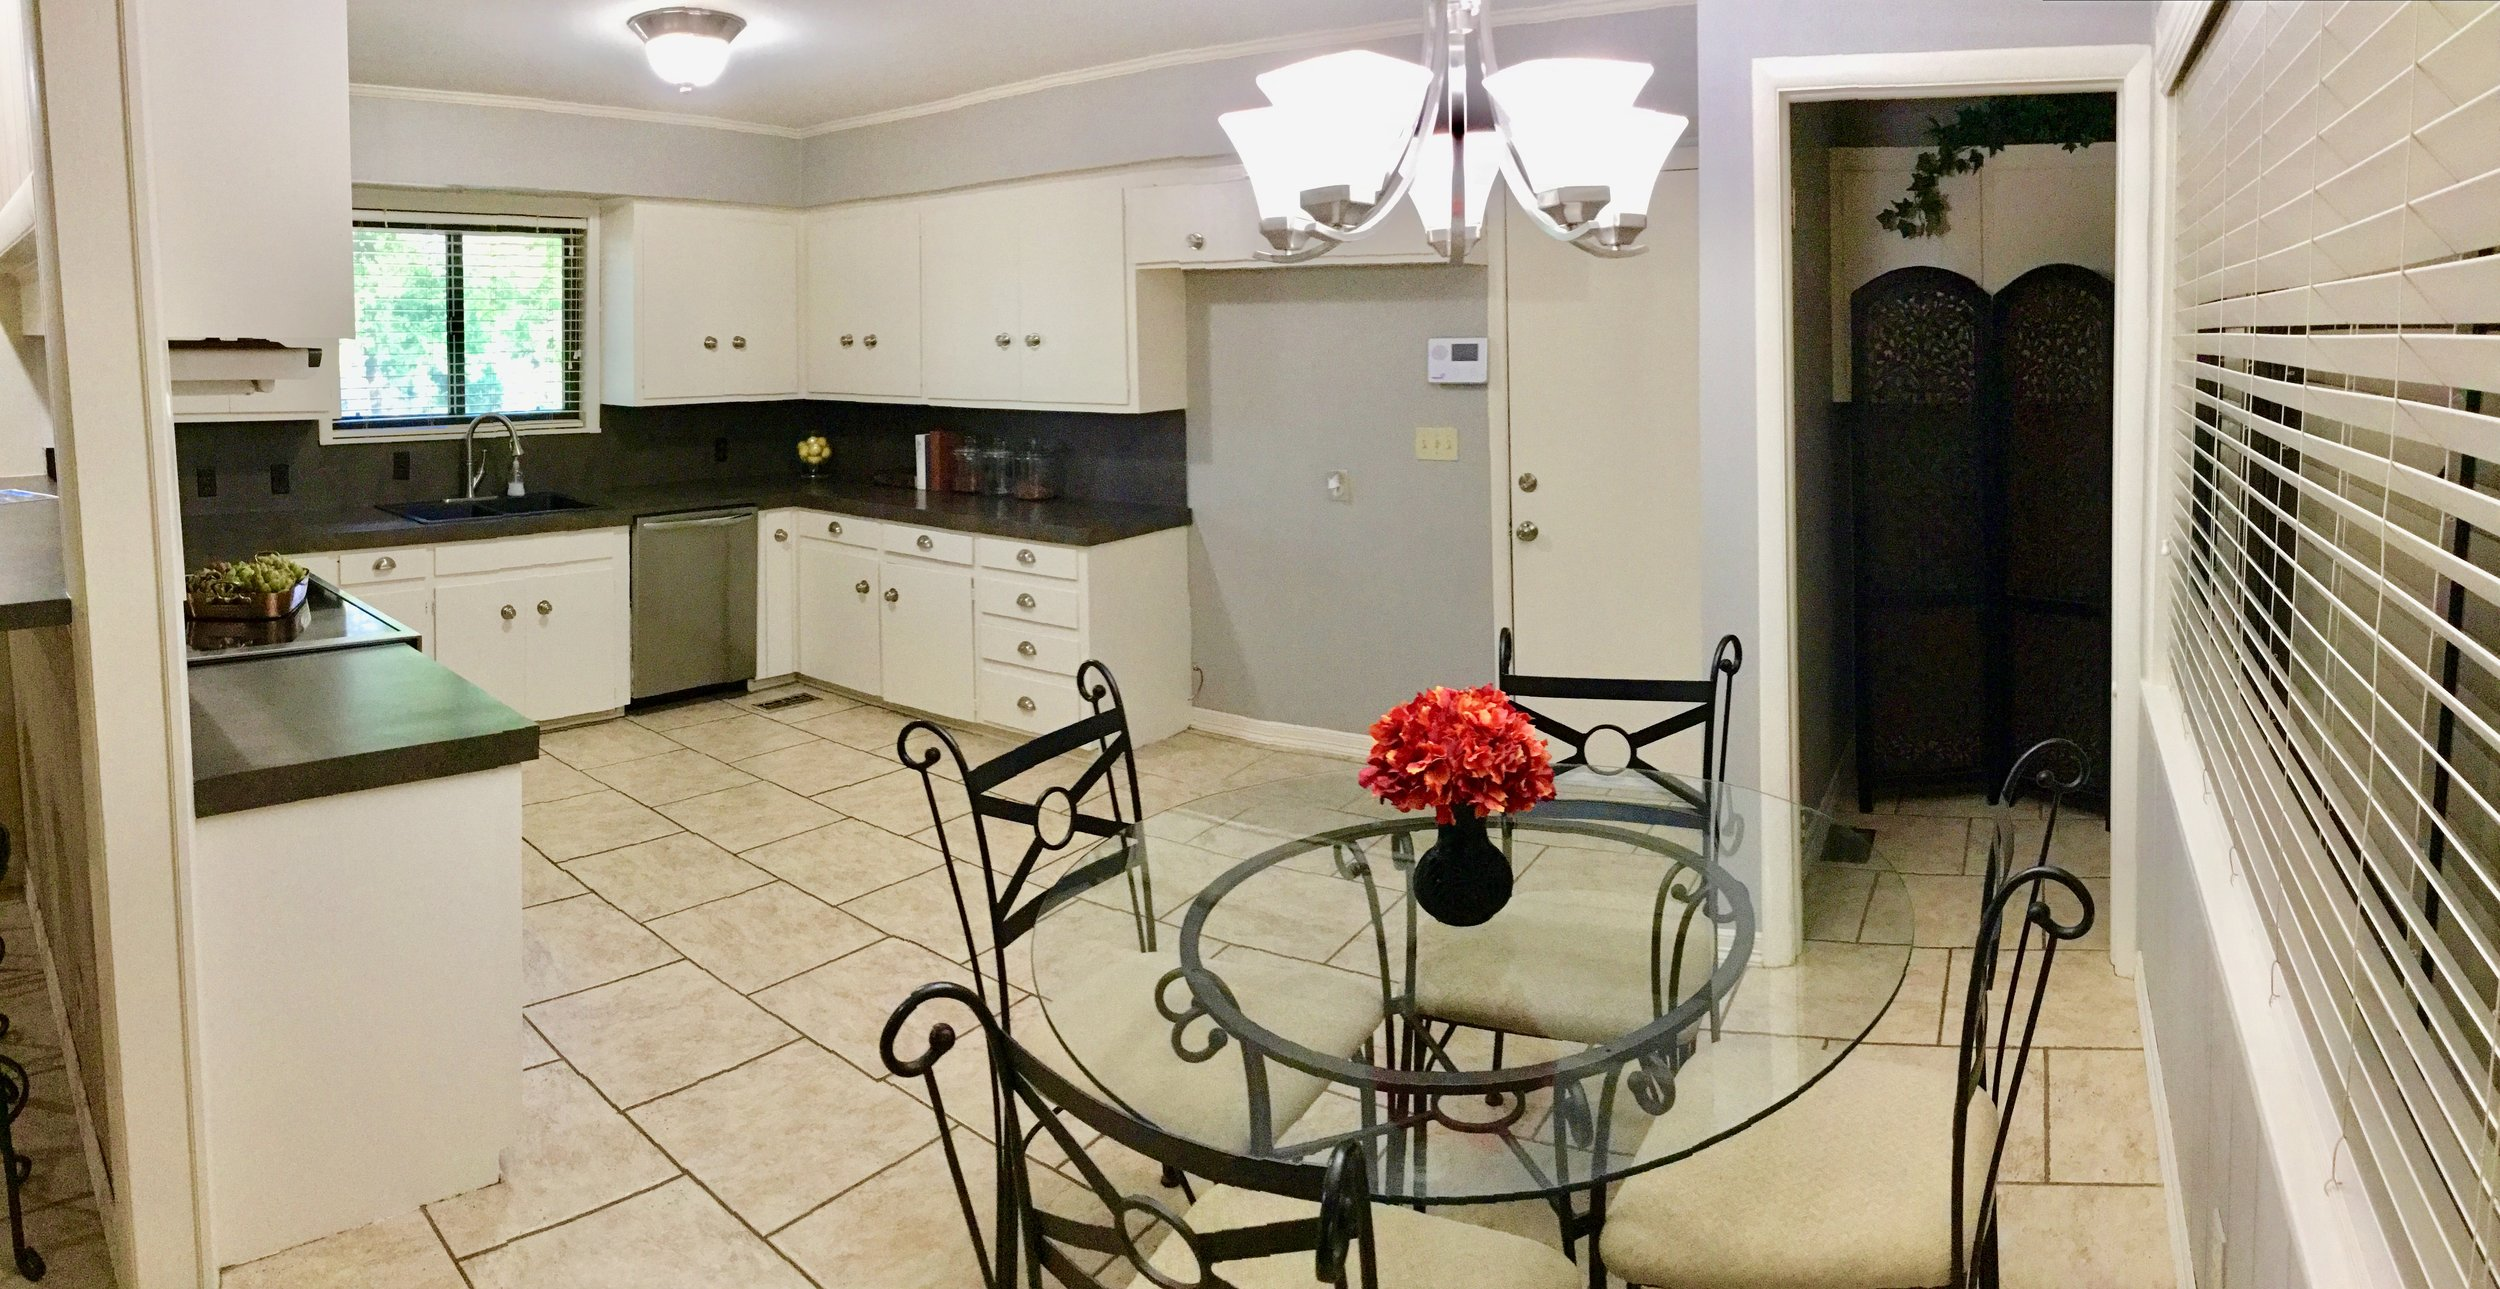 Staging Tulsa - Patrick Henry 4 Bedroom Kitchen2.jpg